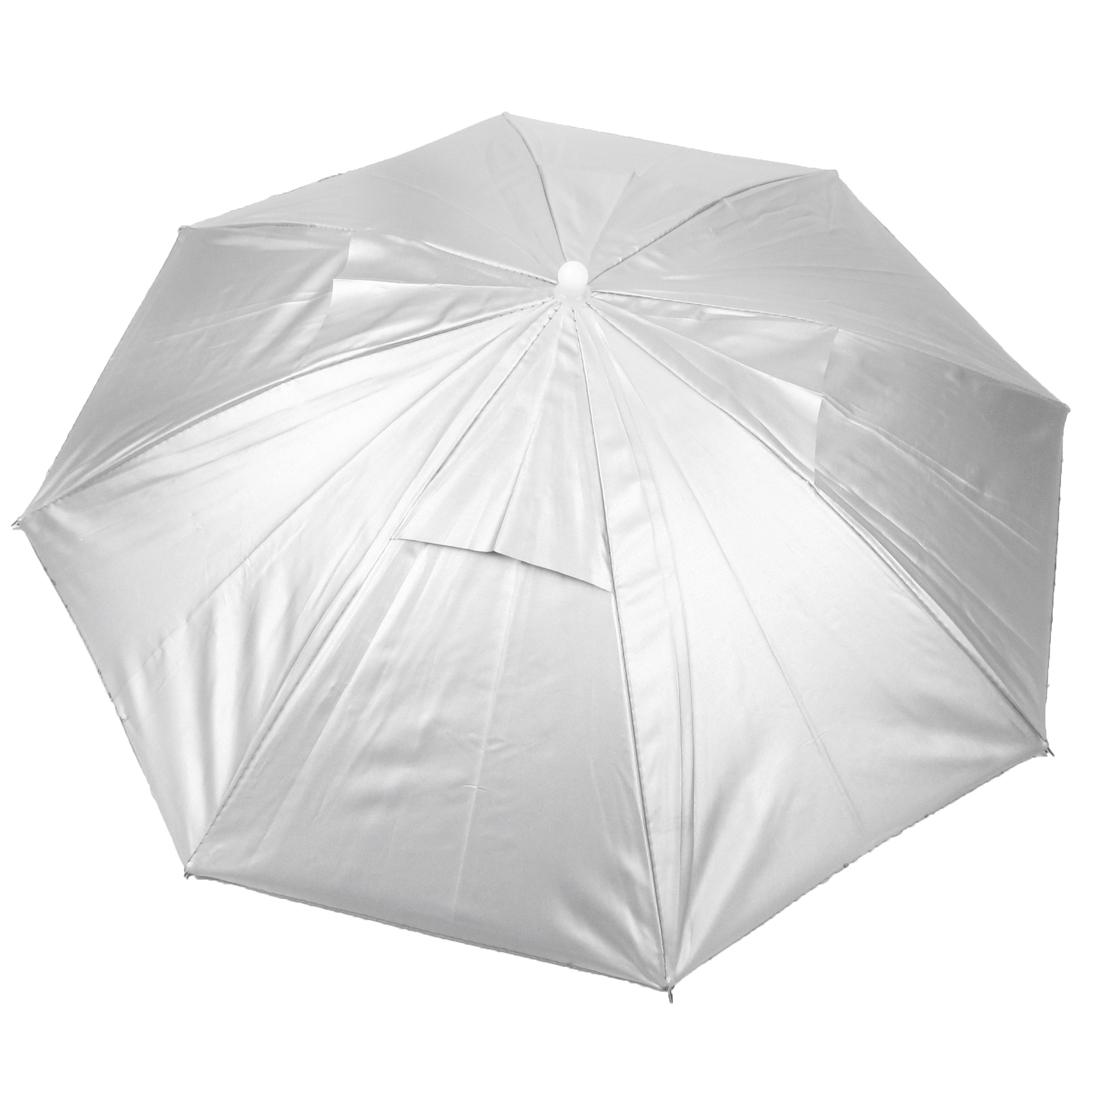 Sports Elastic Head Band Folding Hunting Umbrella Hat Silver Tone